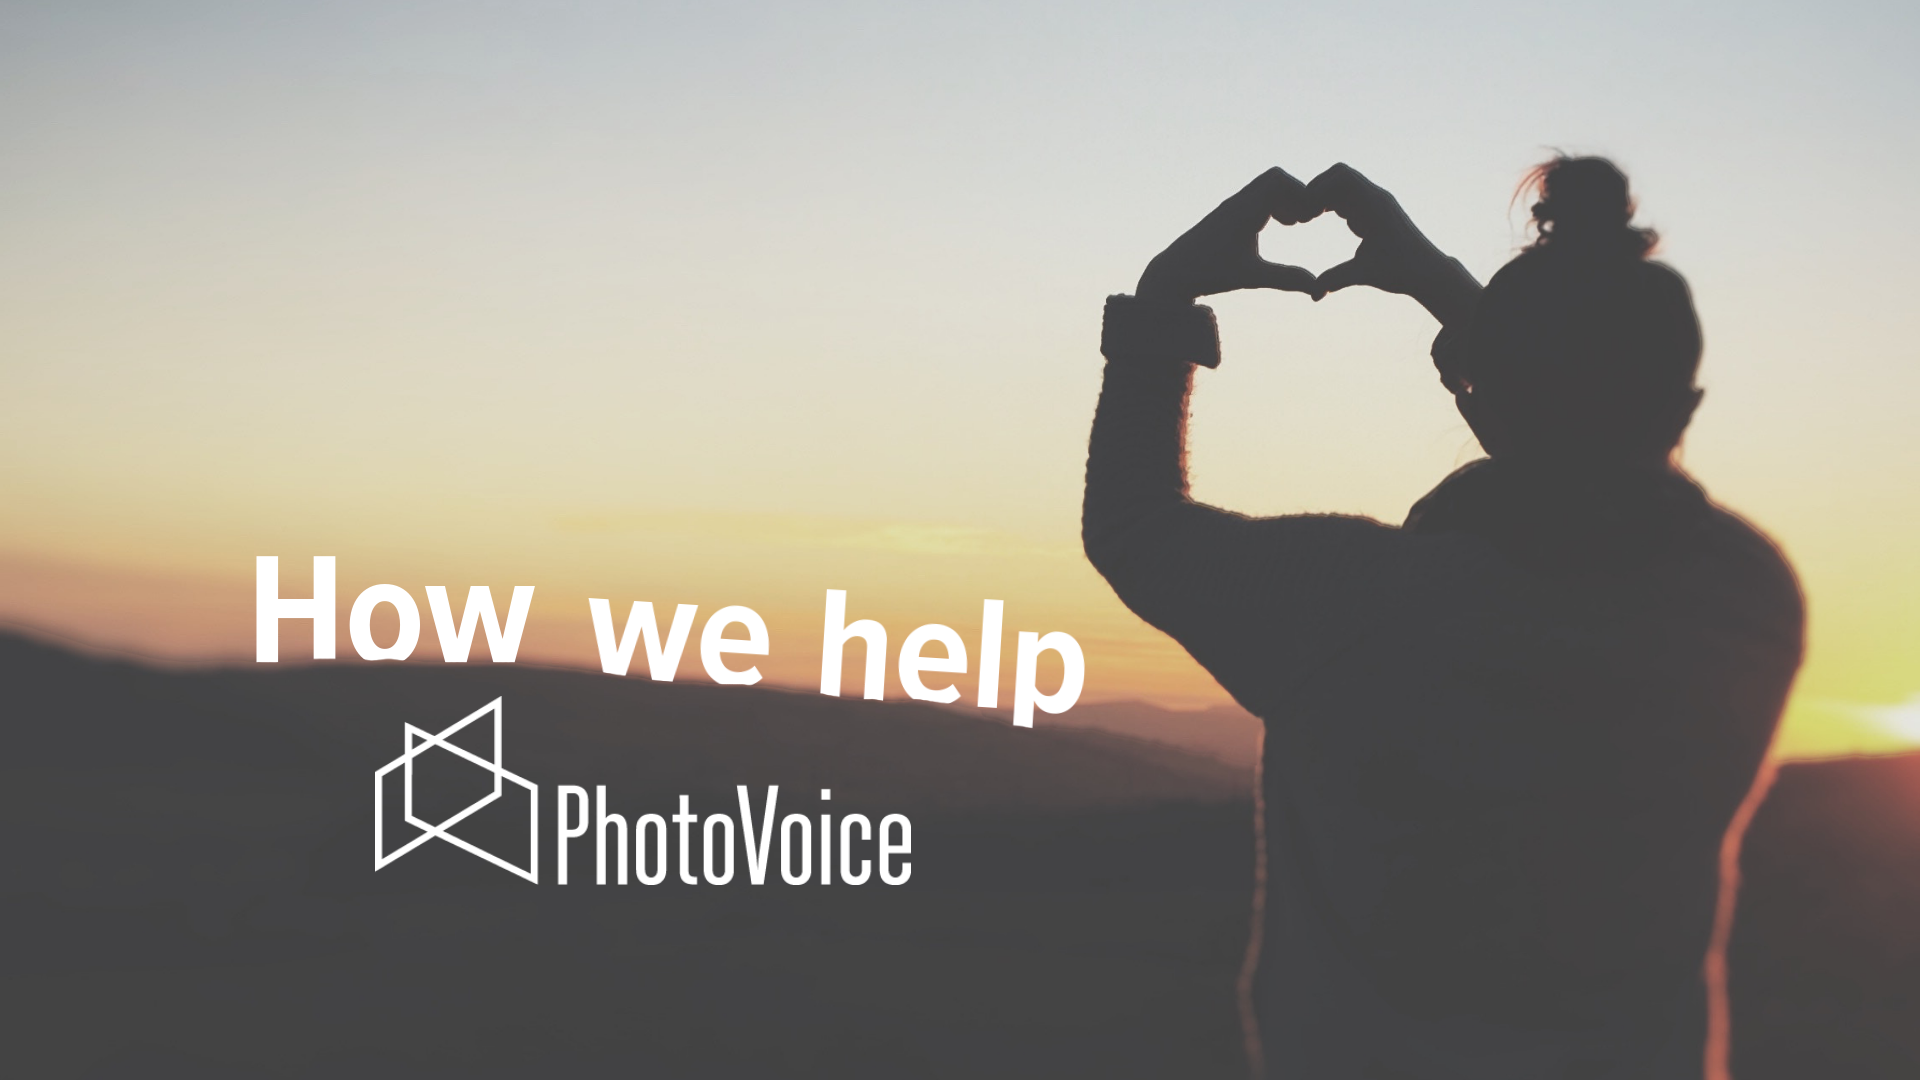 How we help PhotoVoice